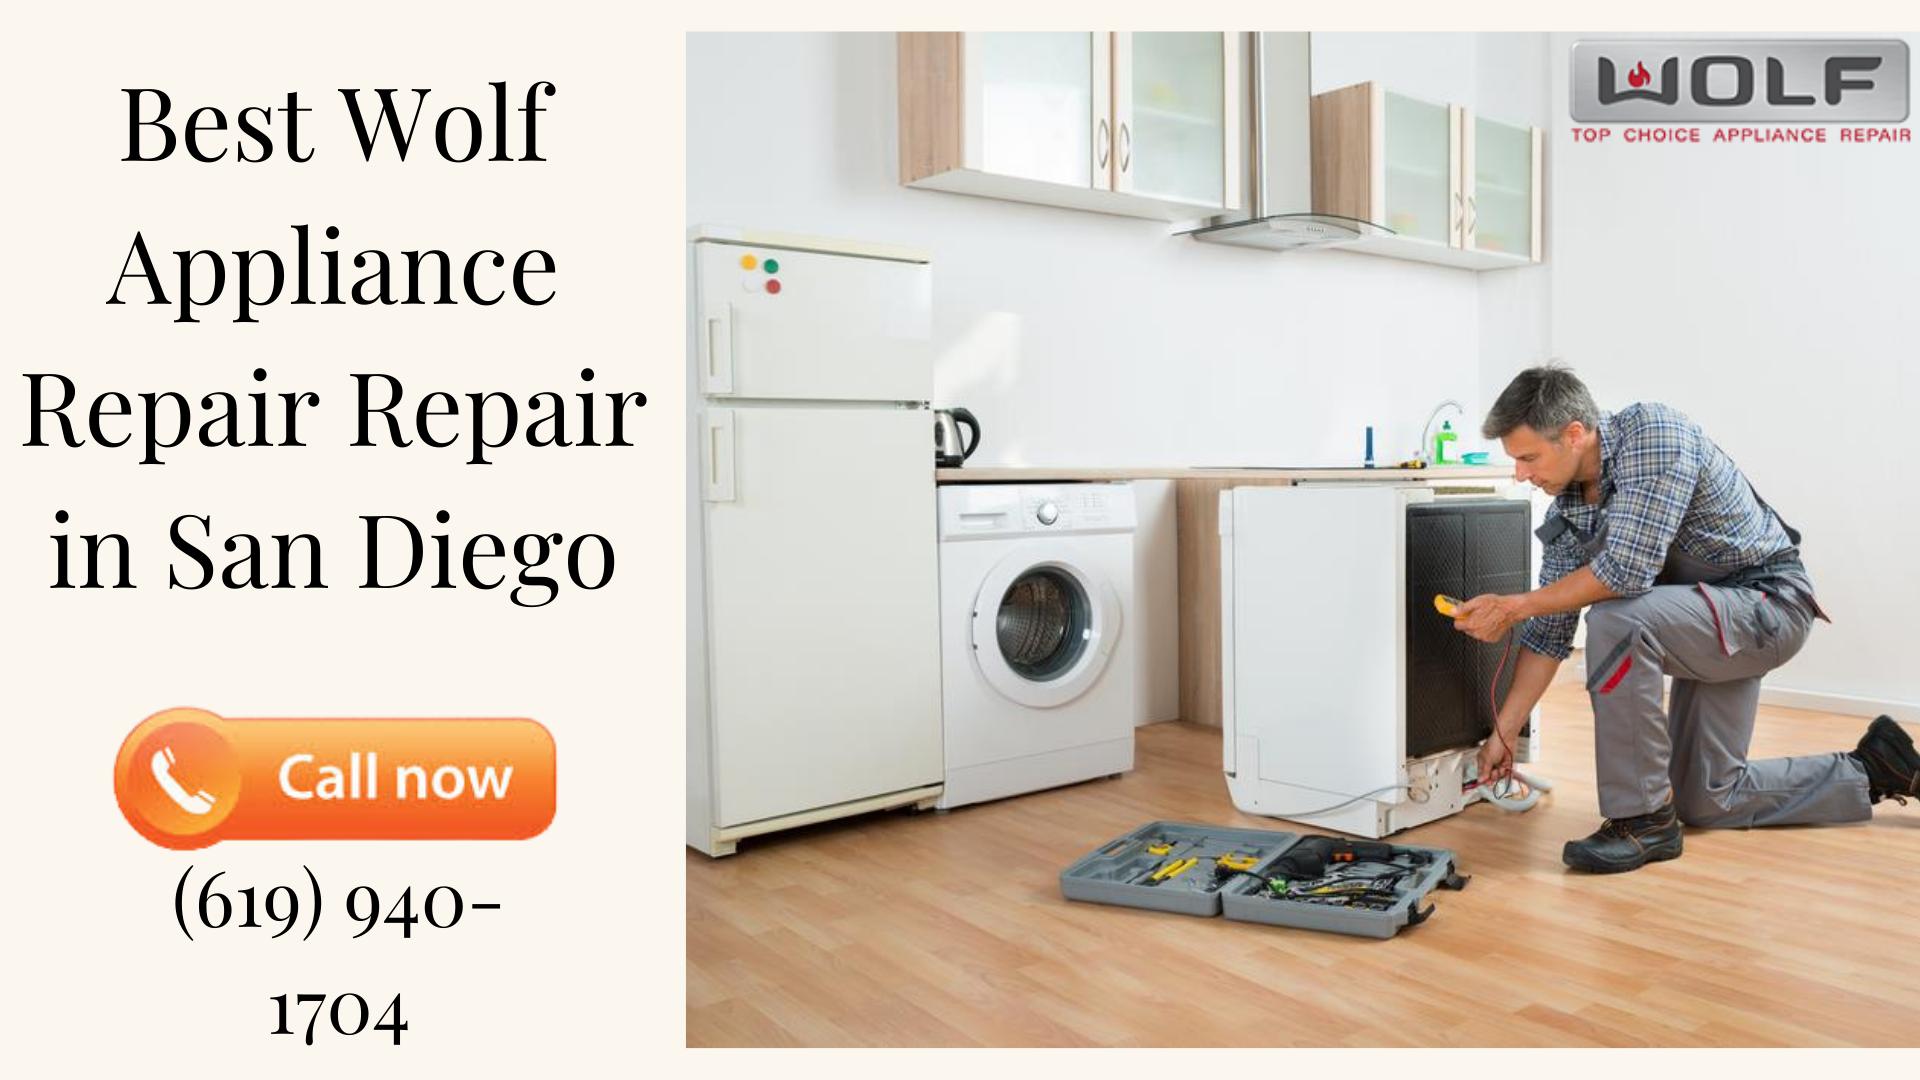 Expert Technicians for Wolf Appliance Repair San Diego